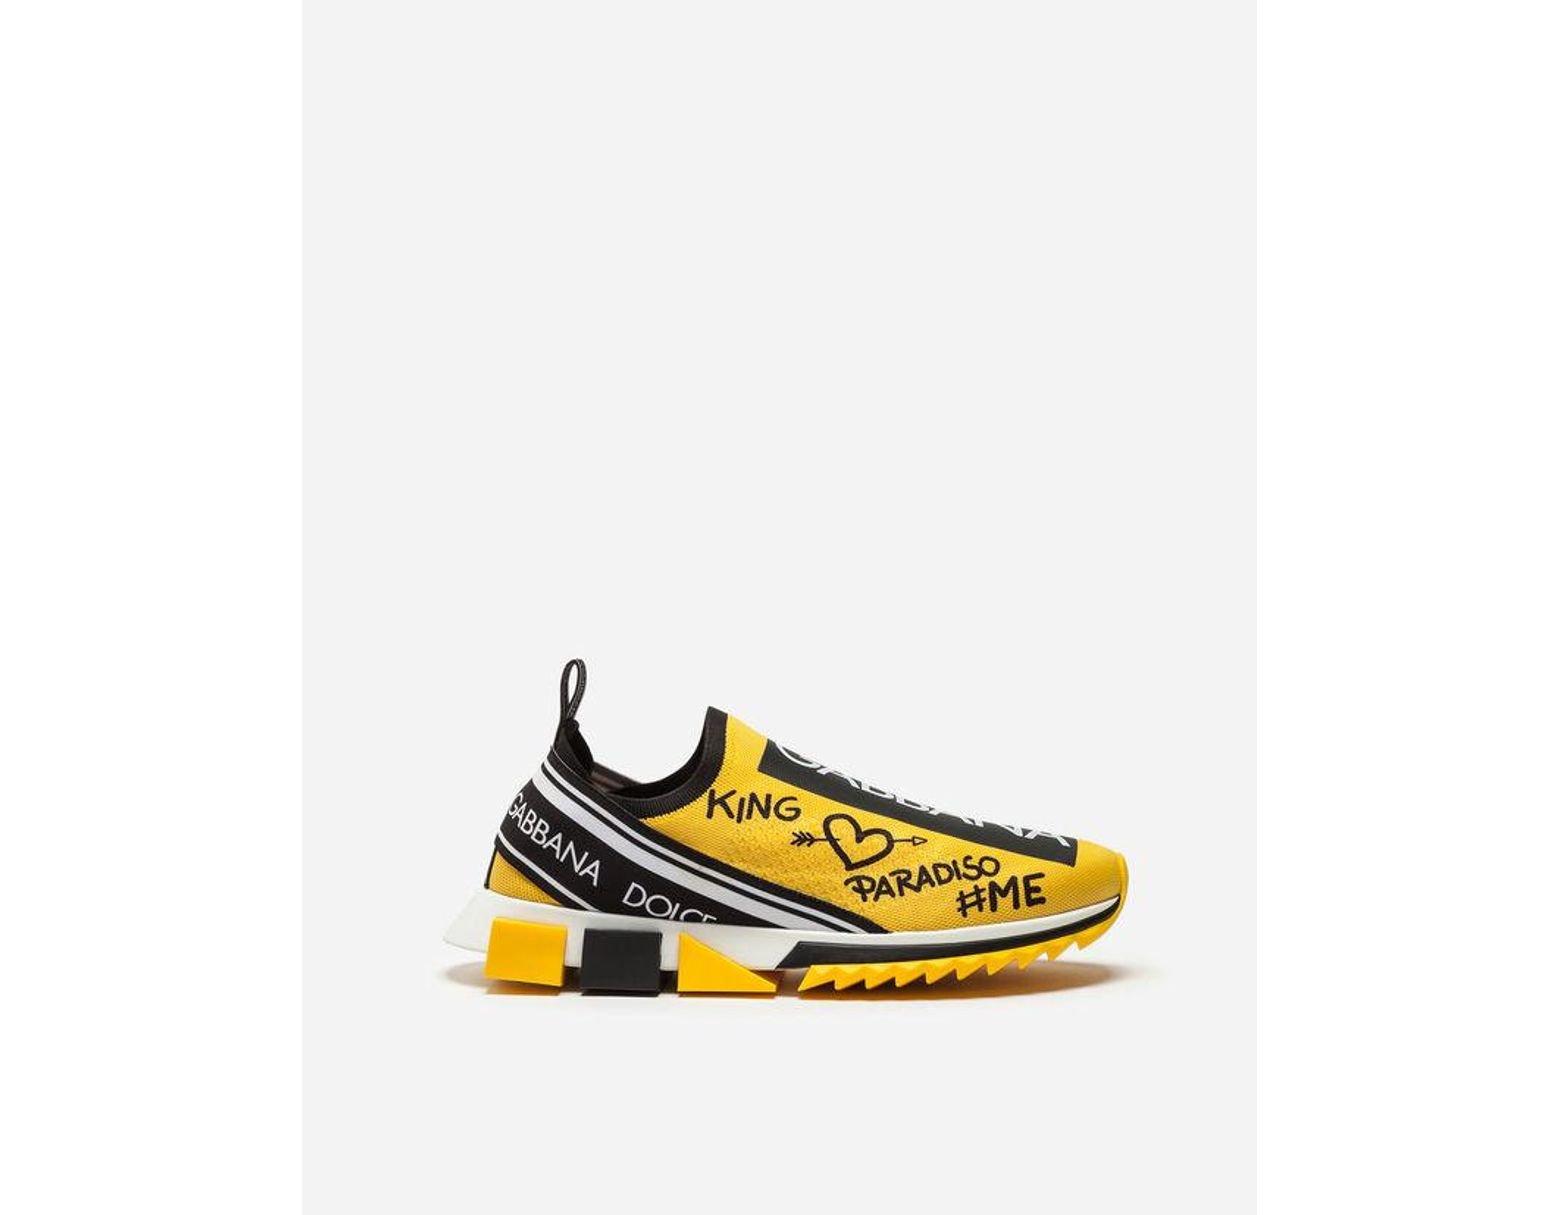 df8e0b3f74 Dolce & Gabbana Sneakers In Sorrento Graffiti Print in Yellow for Men - Lyst